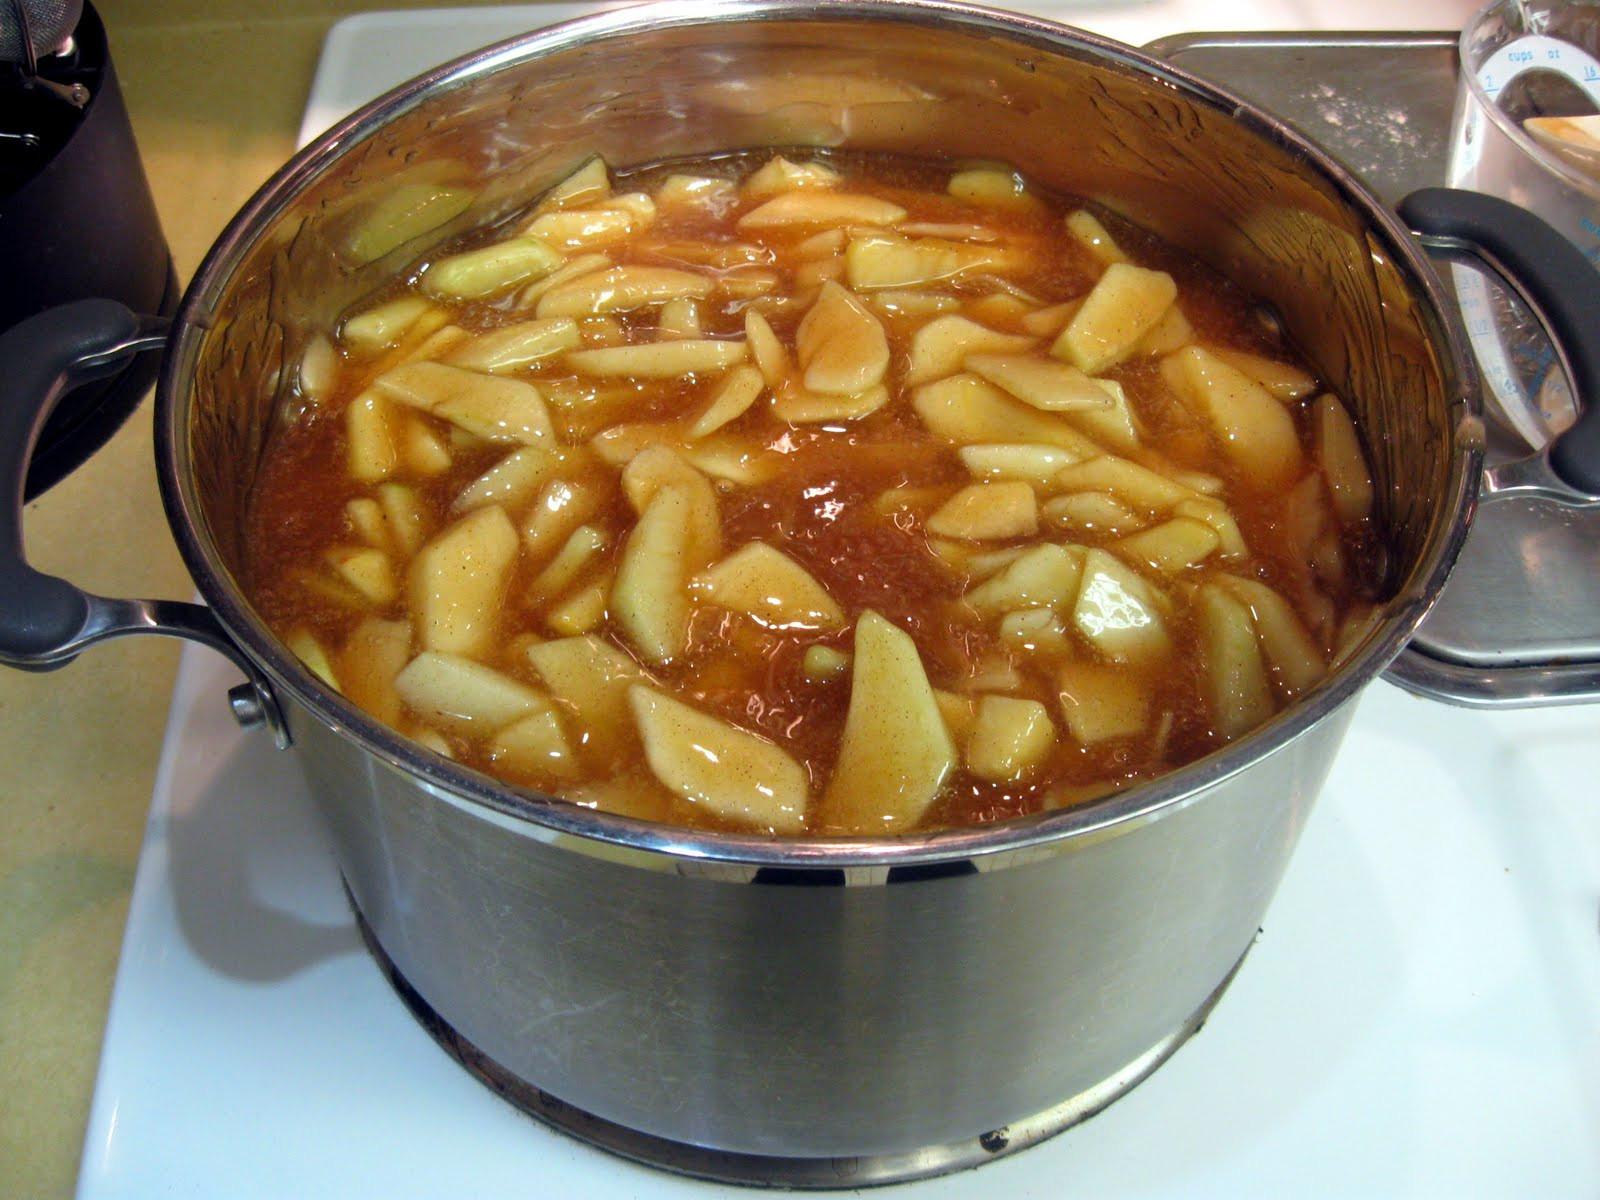 Apple Pie Filling  Taste and See God s Goodness Homemade Apple Pie Filling